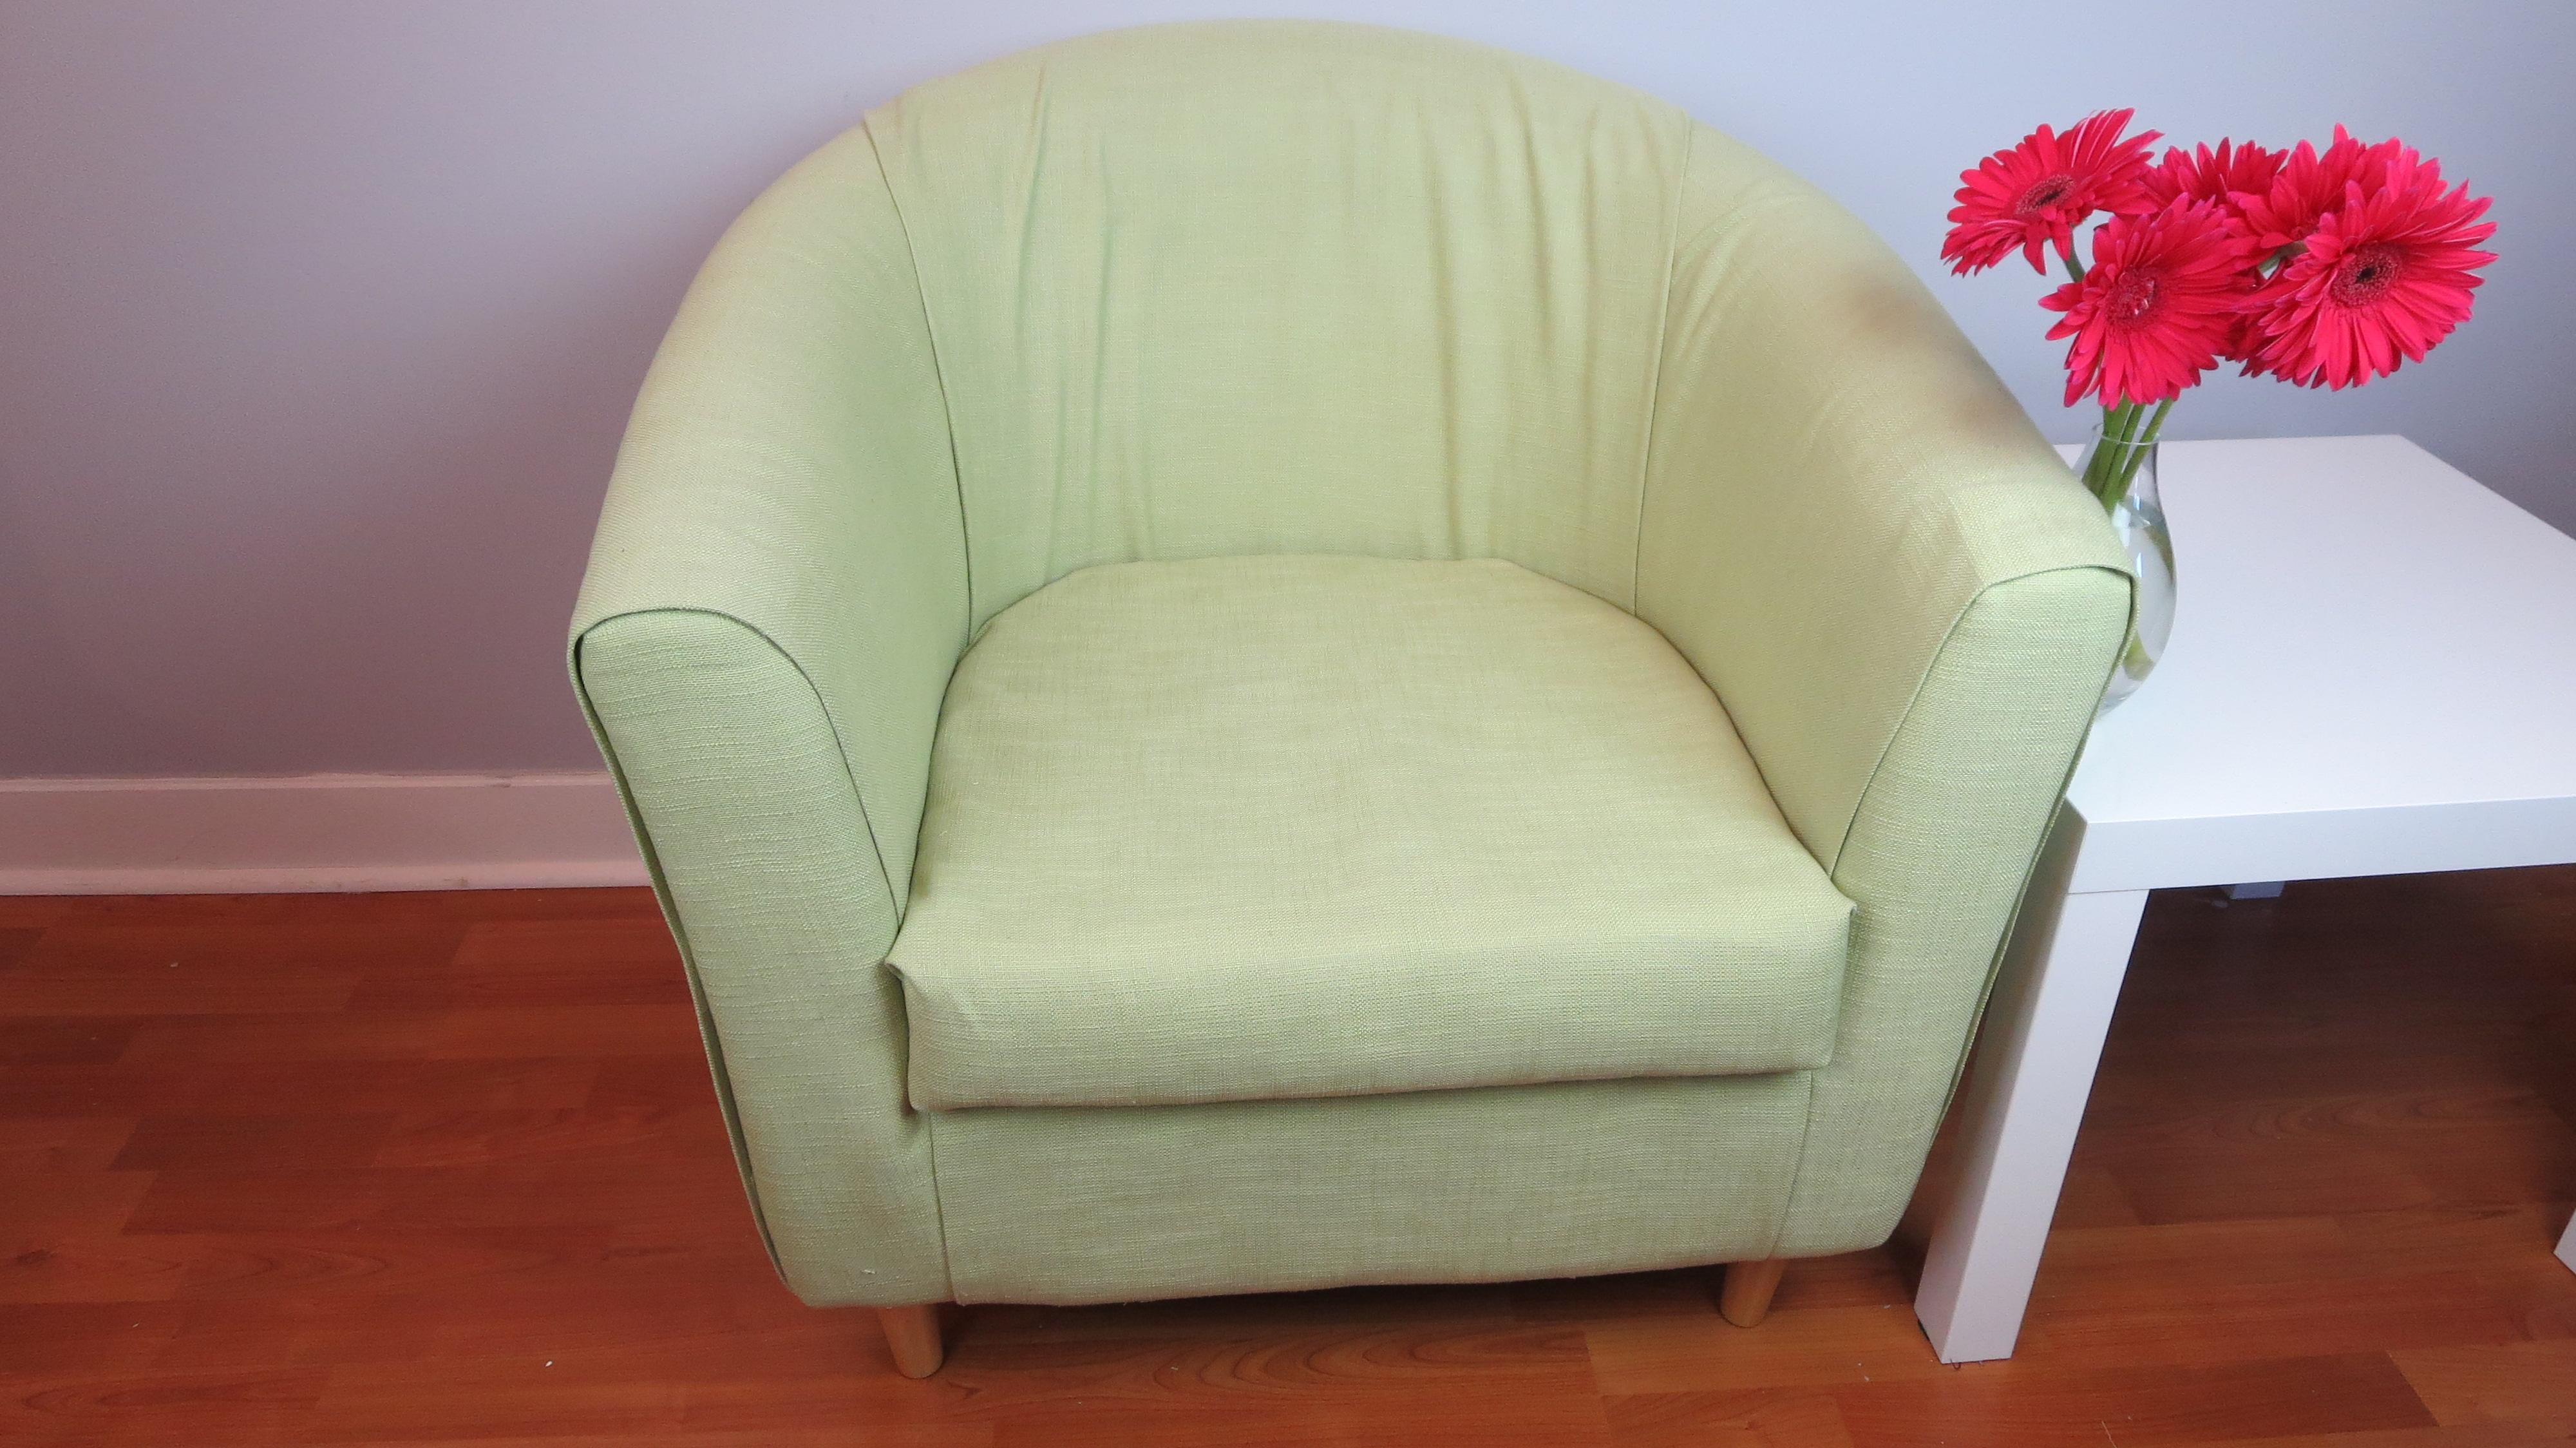 diy upholstery ikea tullsta random relevance. Black Bedroom Furniture Sets. Home Design Ideas